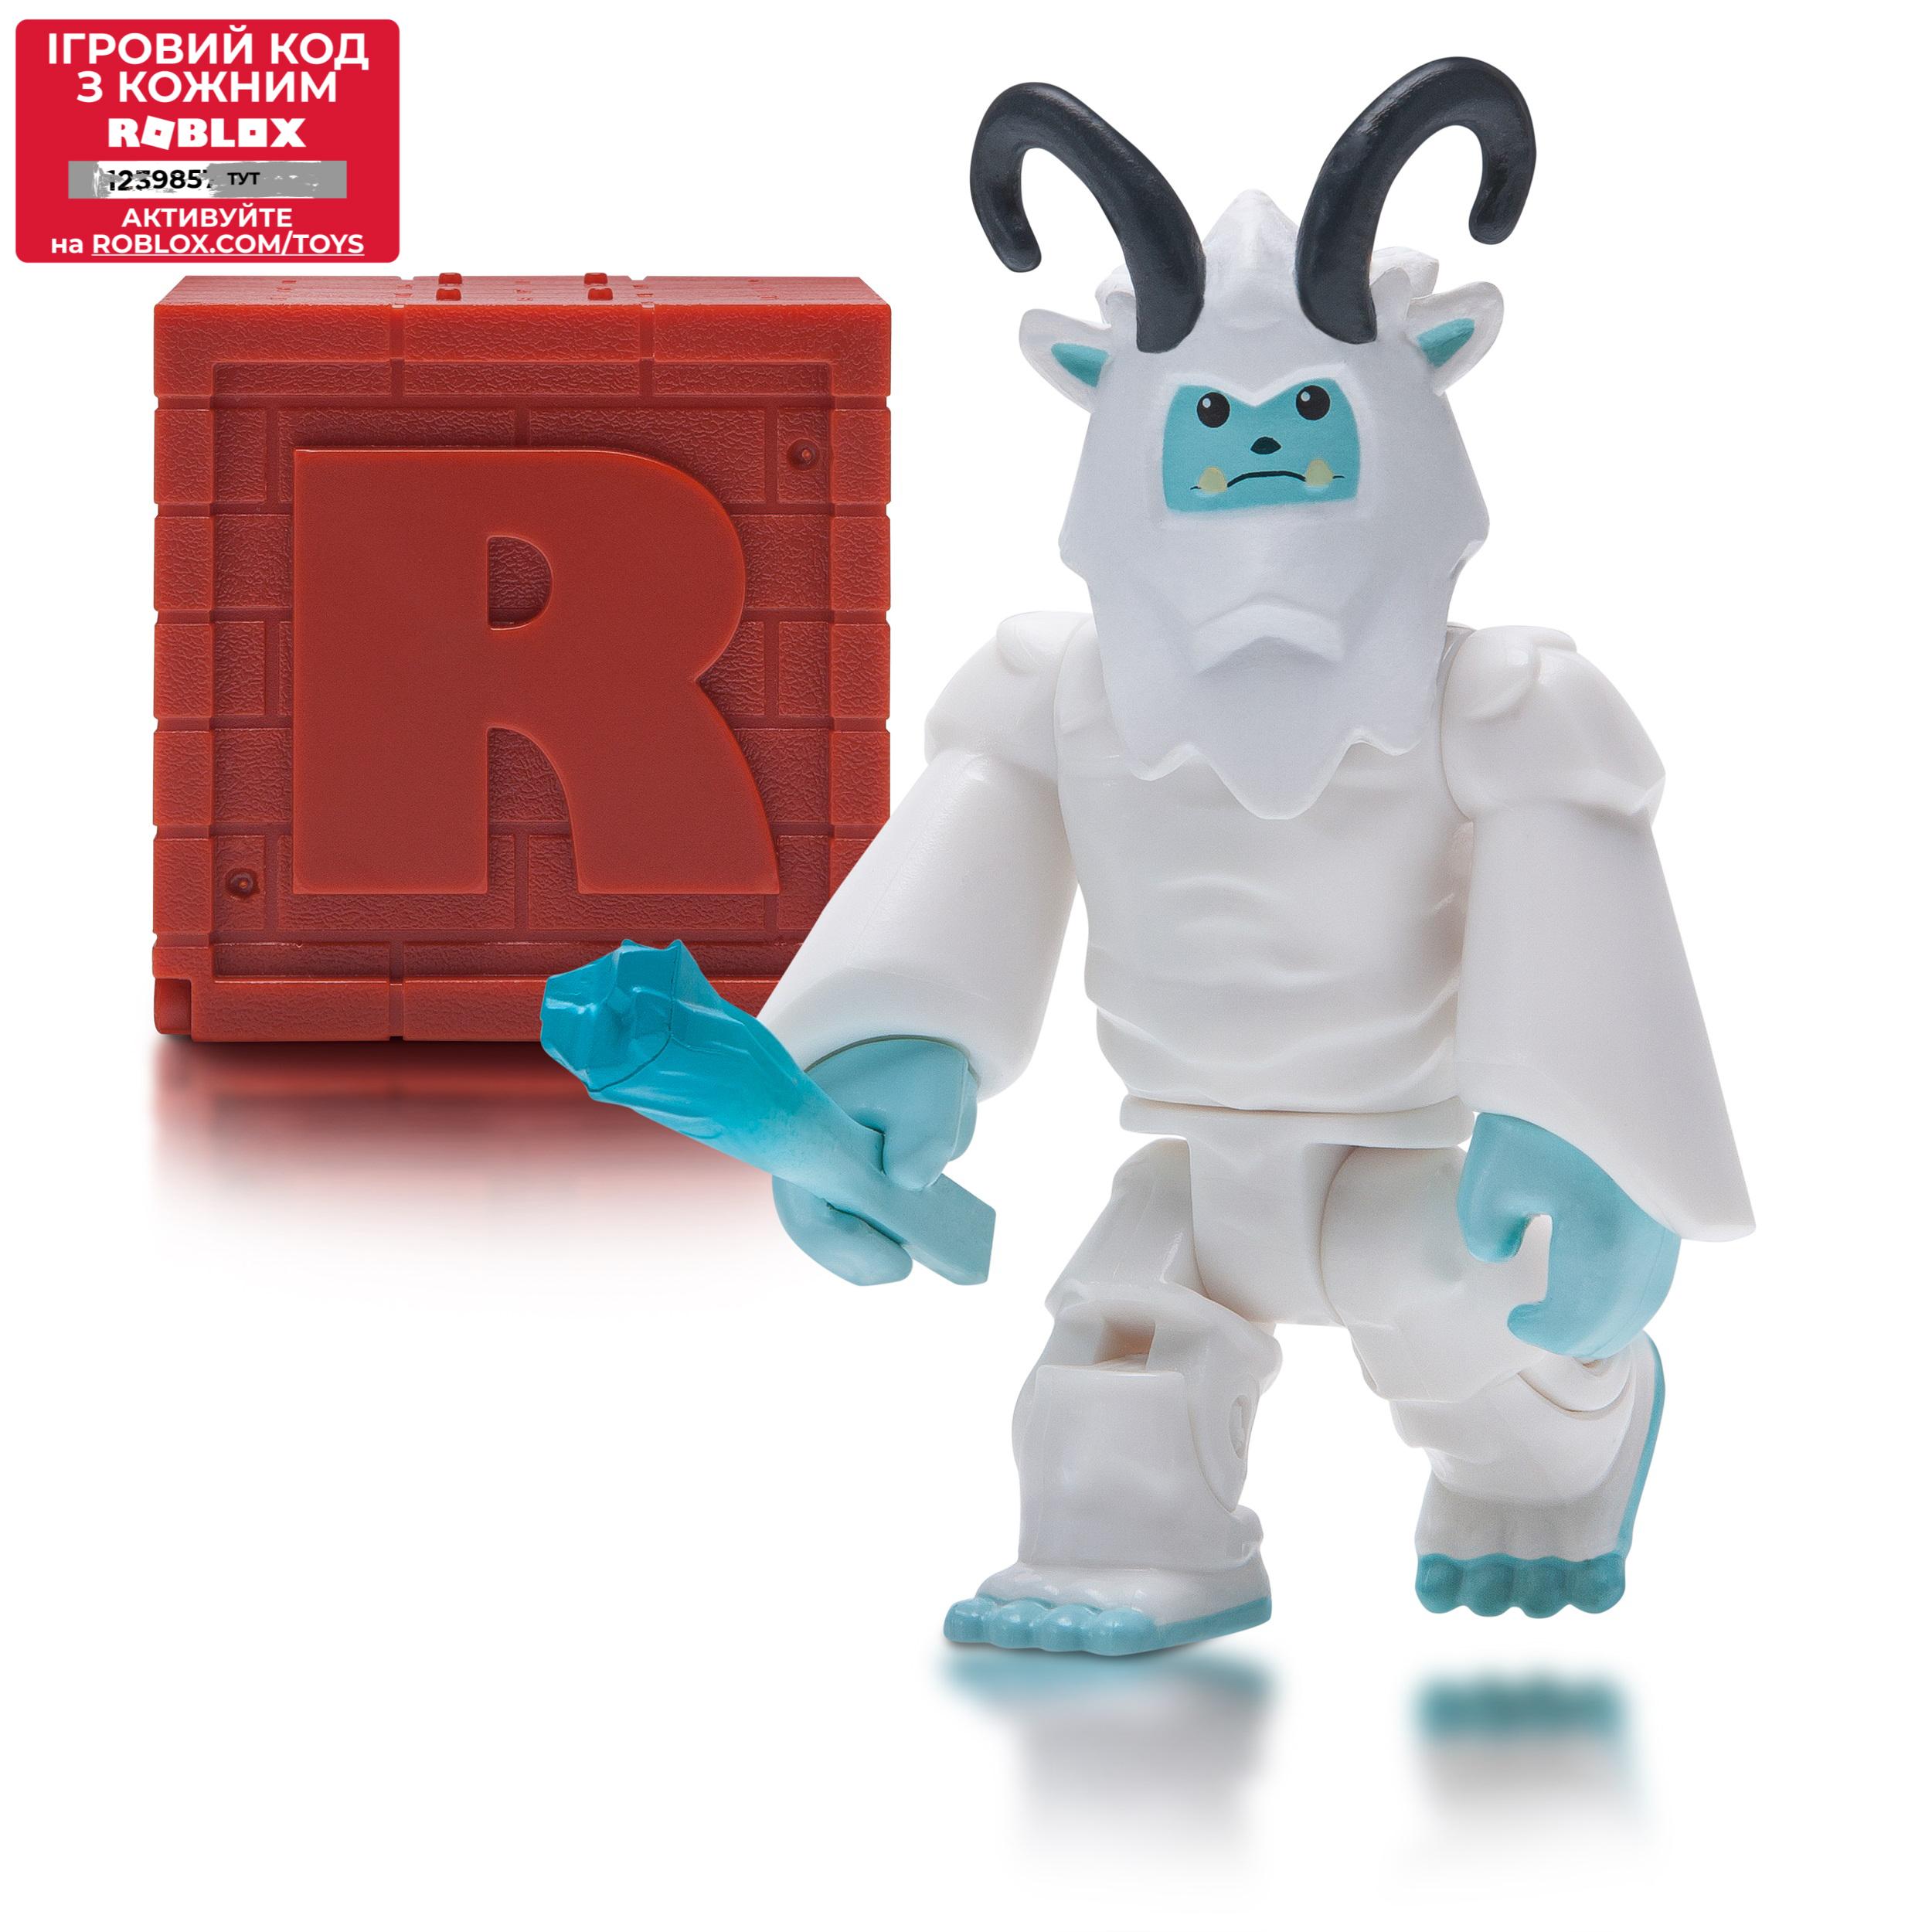 Roblox Игровая коллекционная фигурка Mystery Figures Brick S4